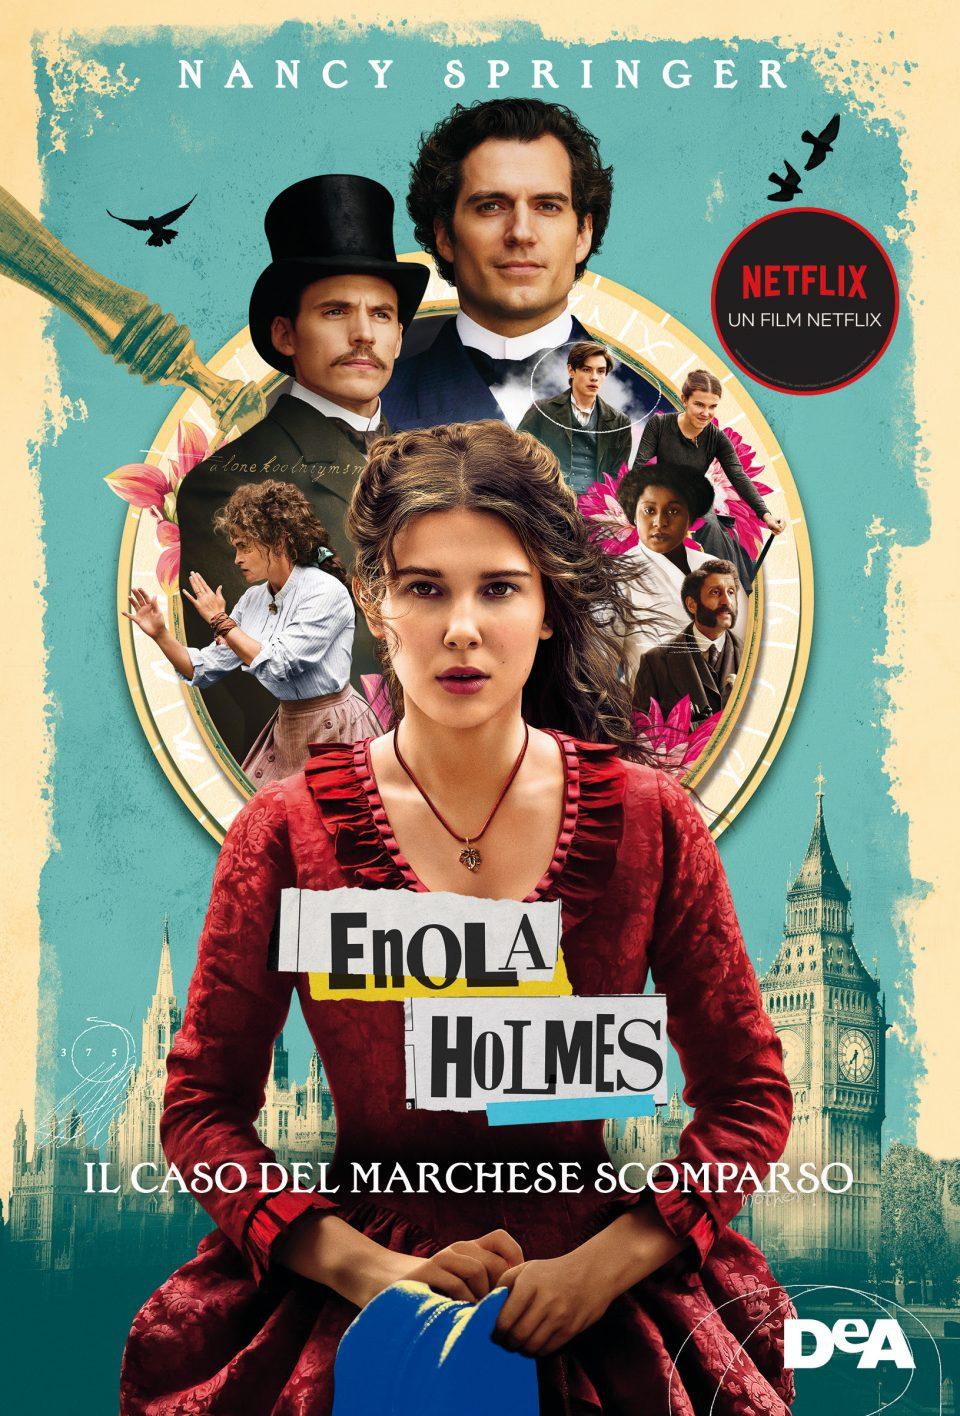 Nancy Springer: ENOLA HOLMES